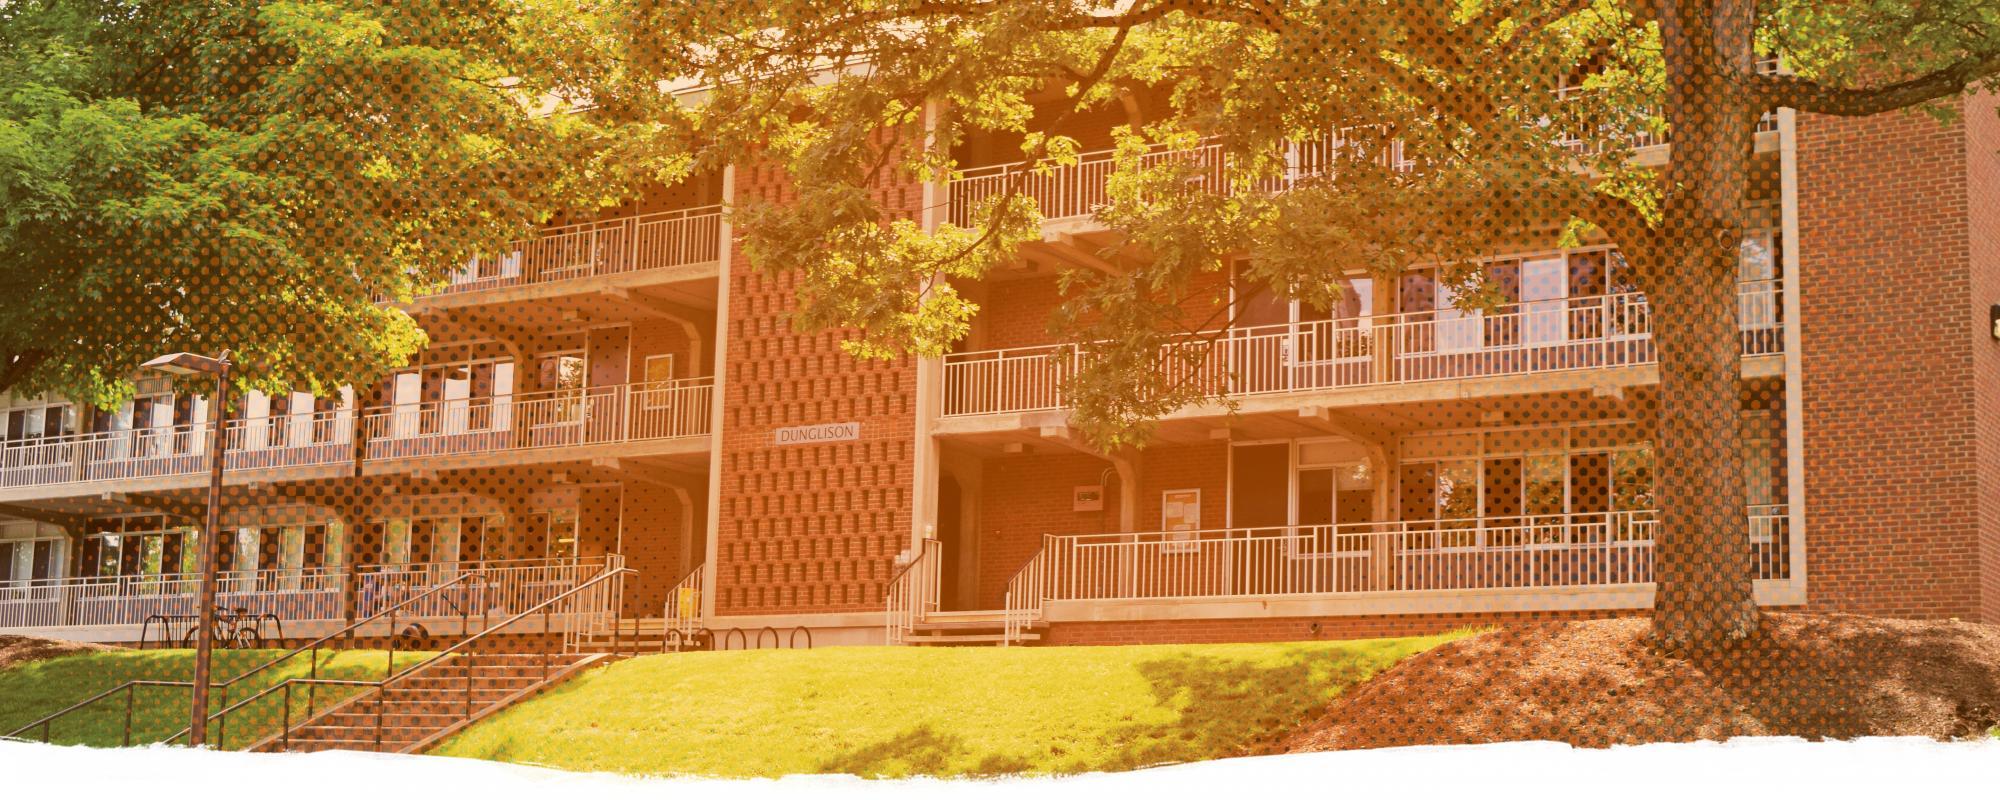 Alderman Road Suite-Style Residences